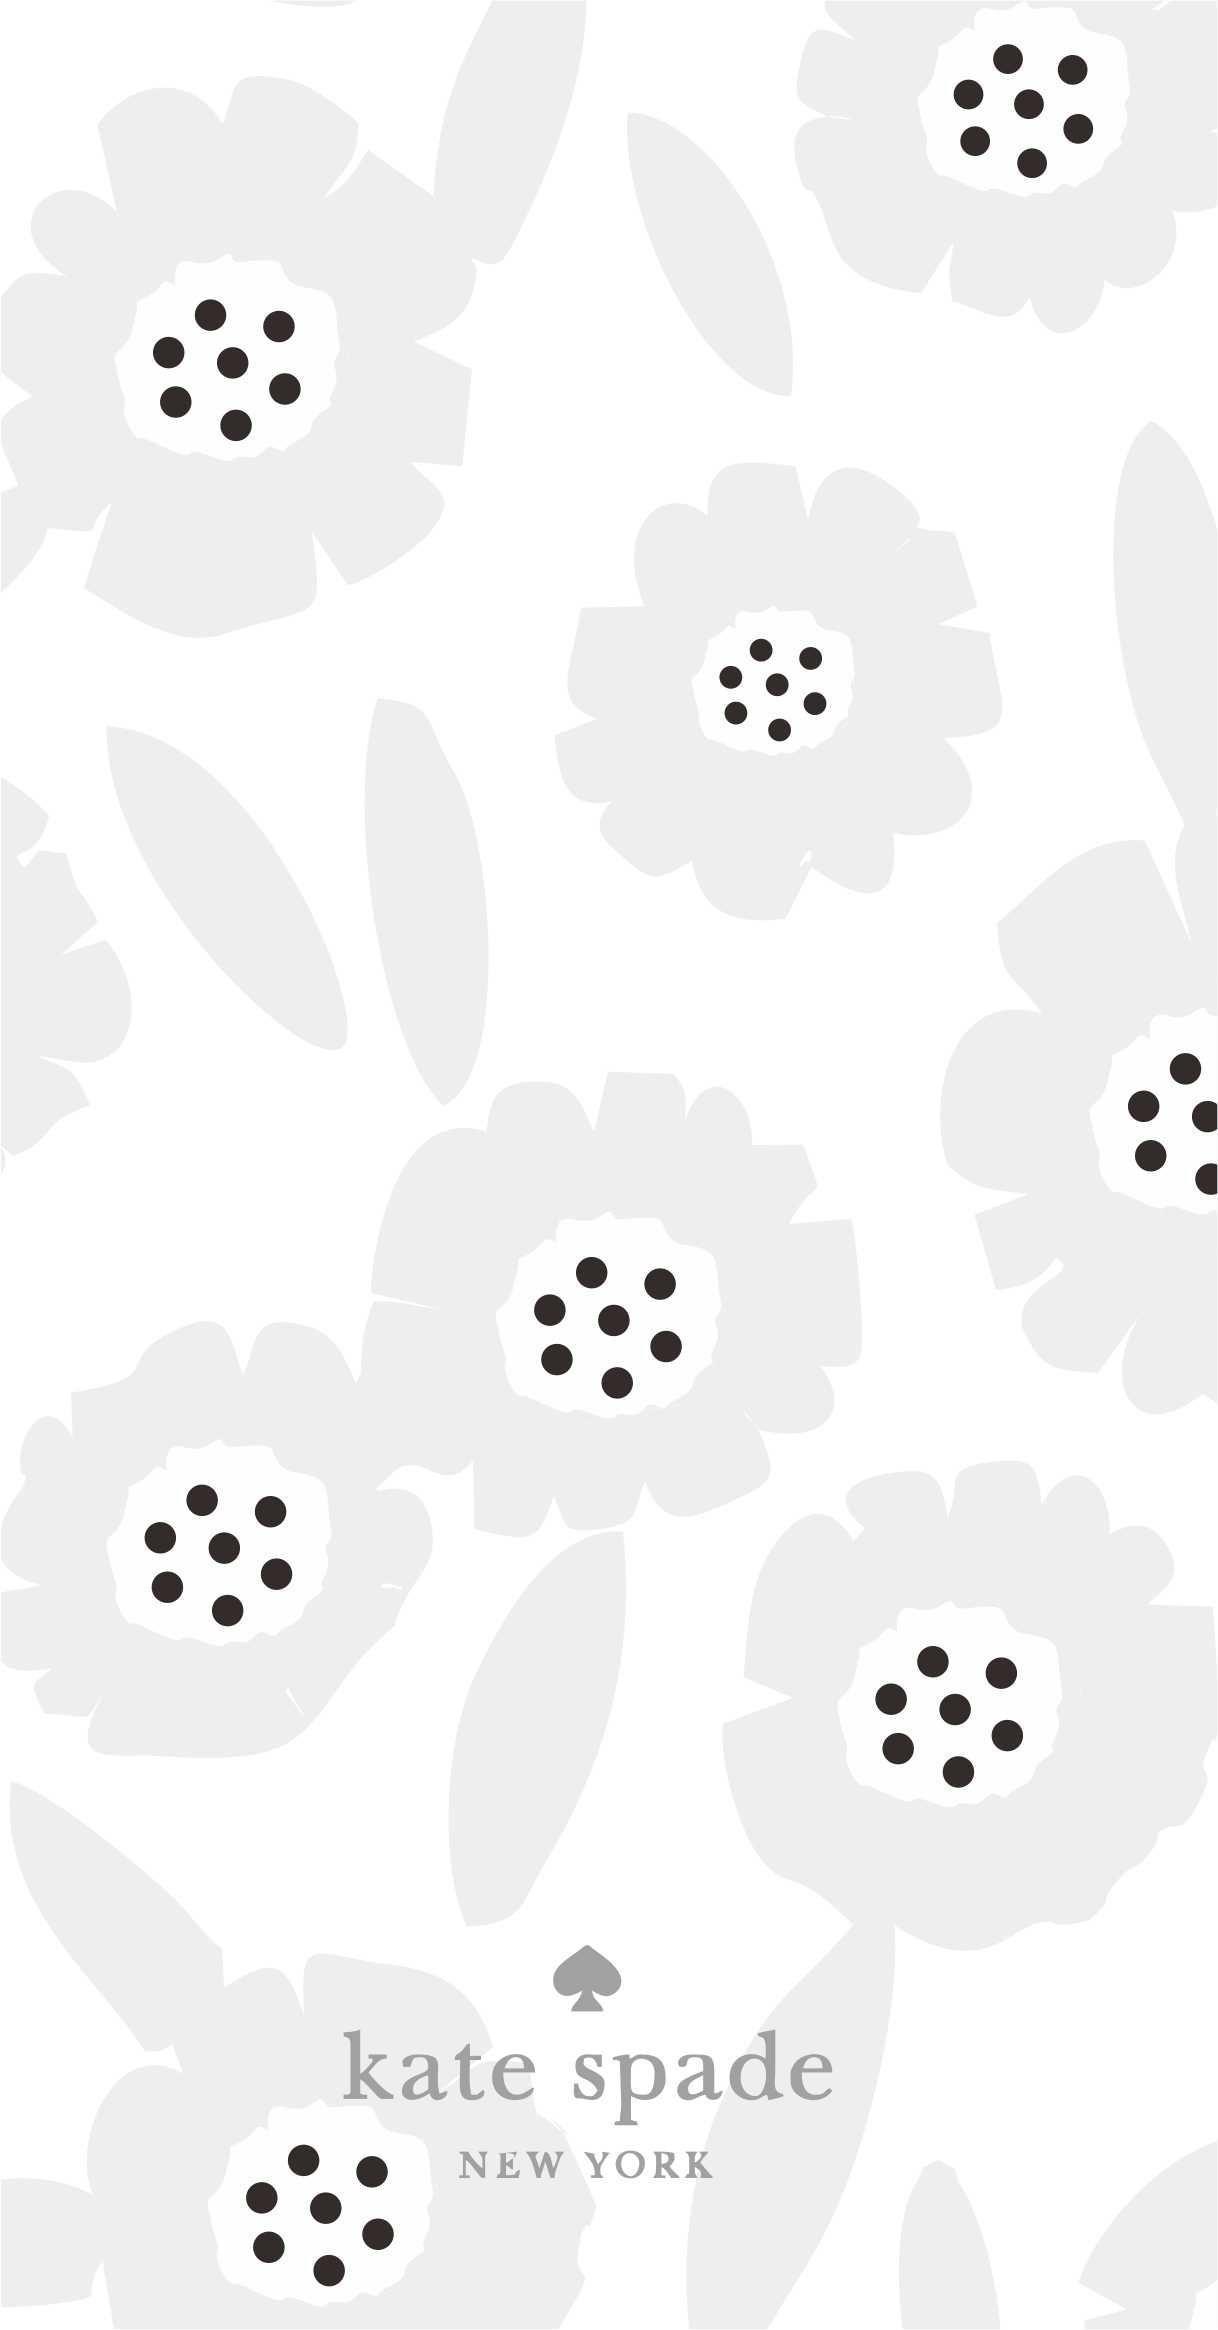 Kate Spade Iphone Wallpaper 2019 Ipcwallpapers Iphone Wallpaper Kate Spade Kate Spade Desktop Wallpaper Ipad Wallpaper Kate Spade